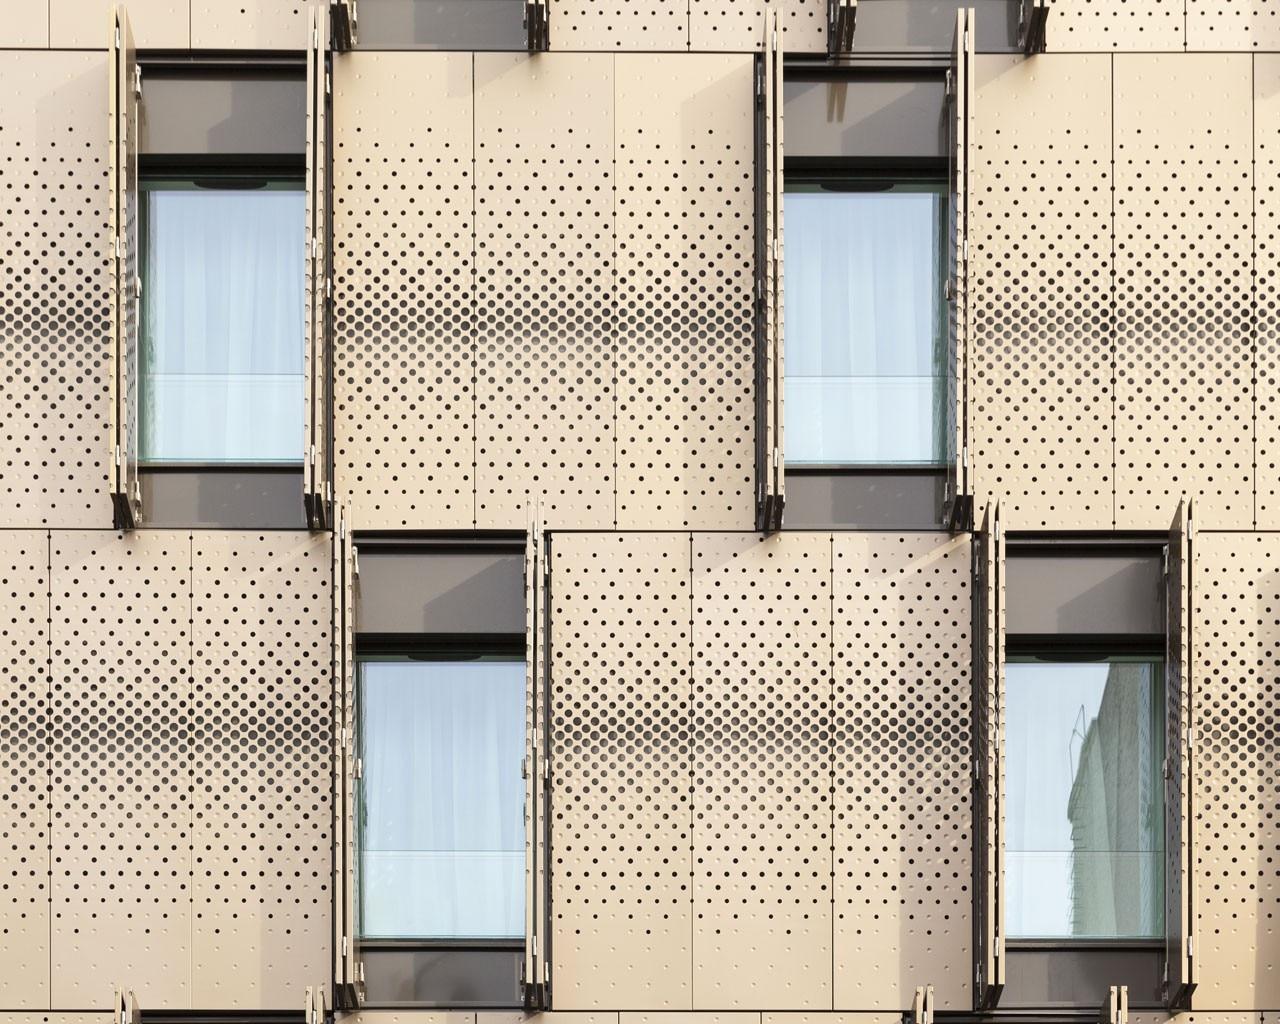 Case per studenti a parigi domus for Architettura a parigi